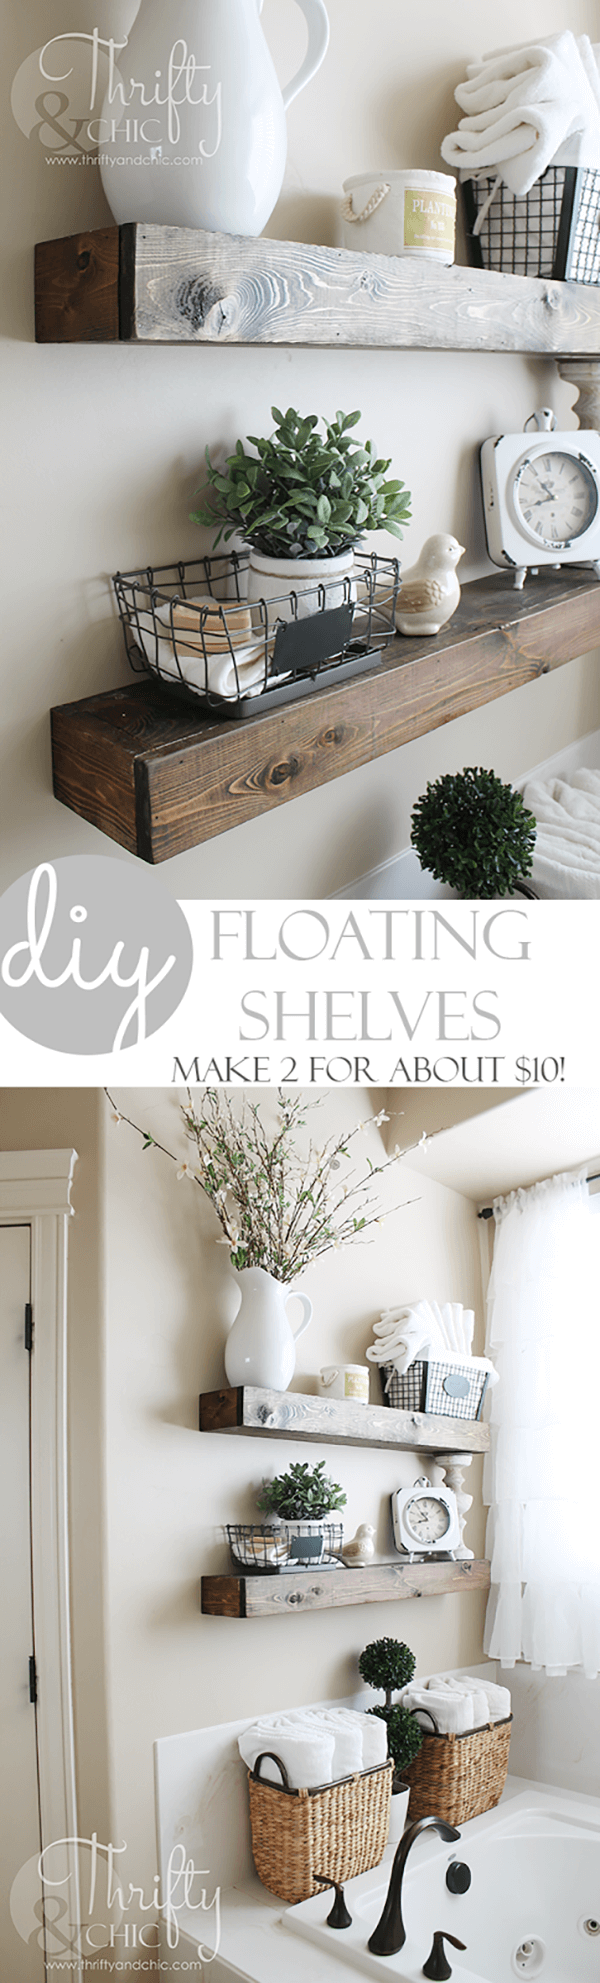 Petite Chateau DIY Shelf Inspiration